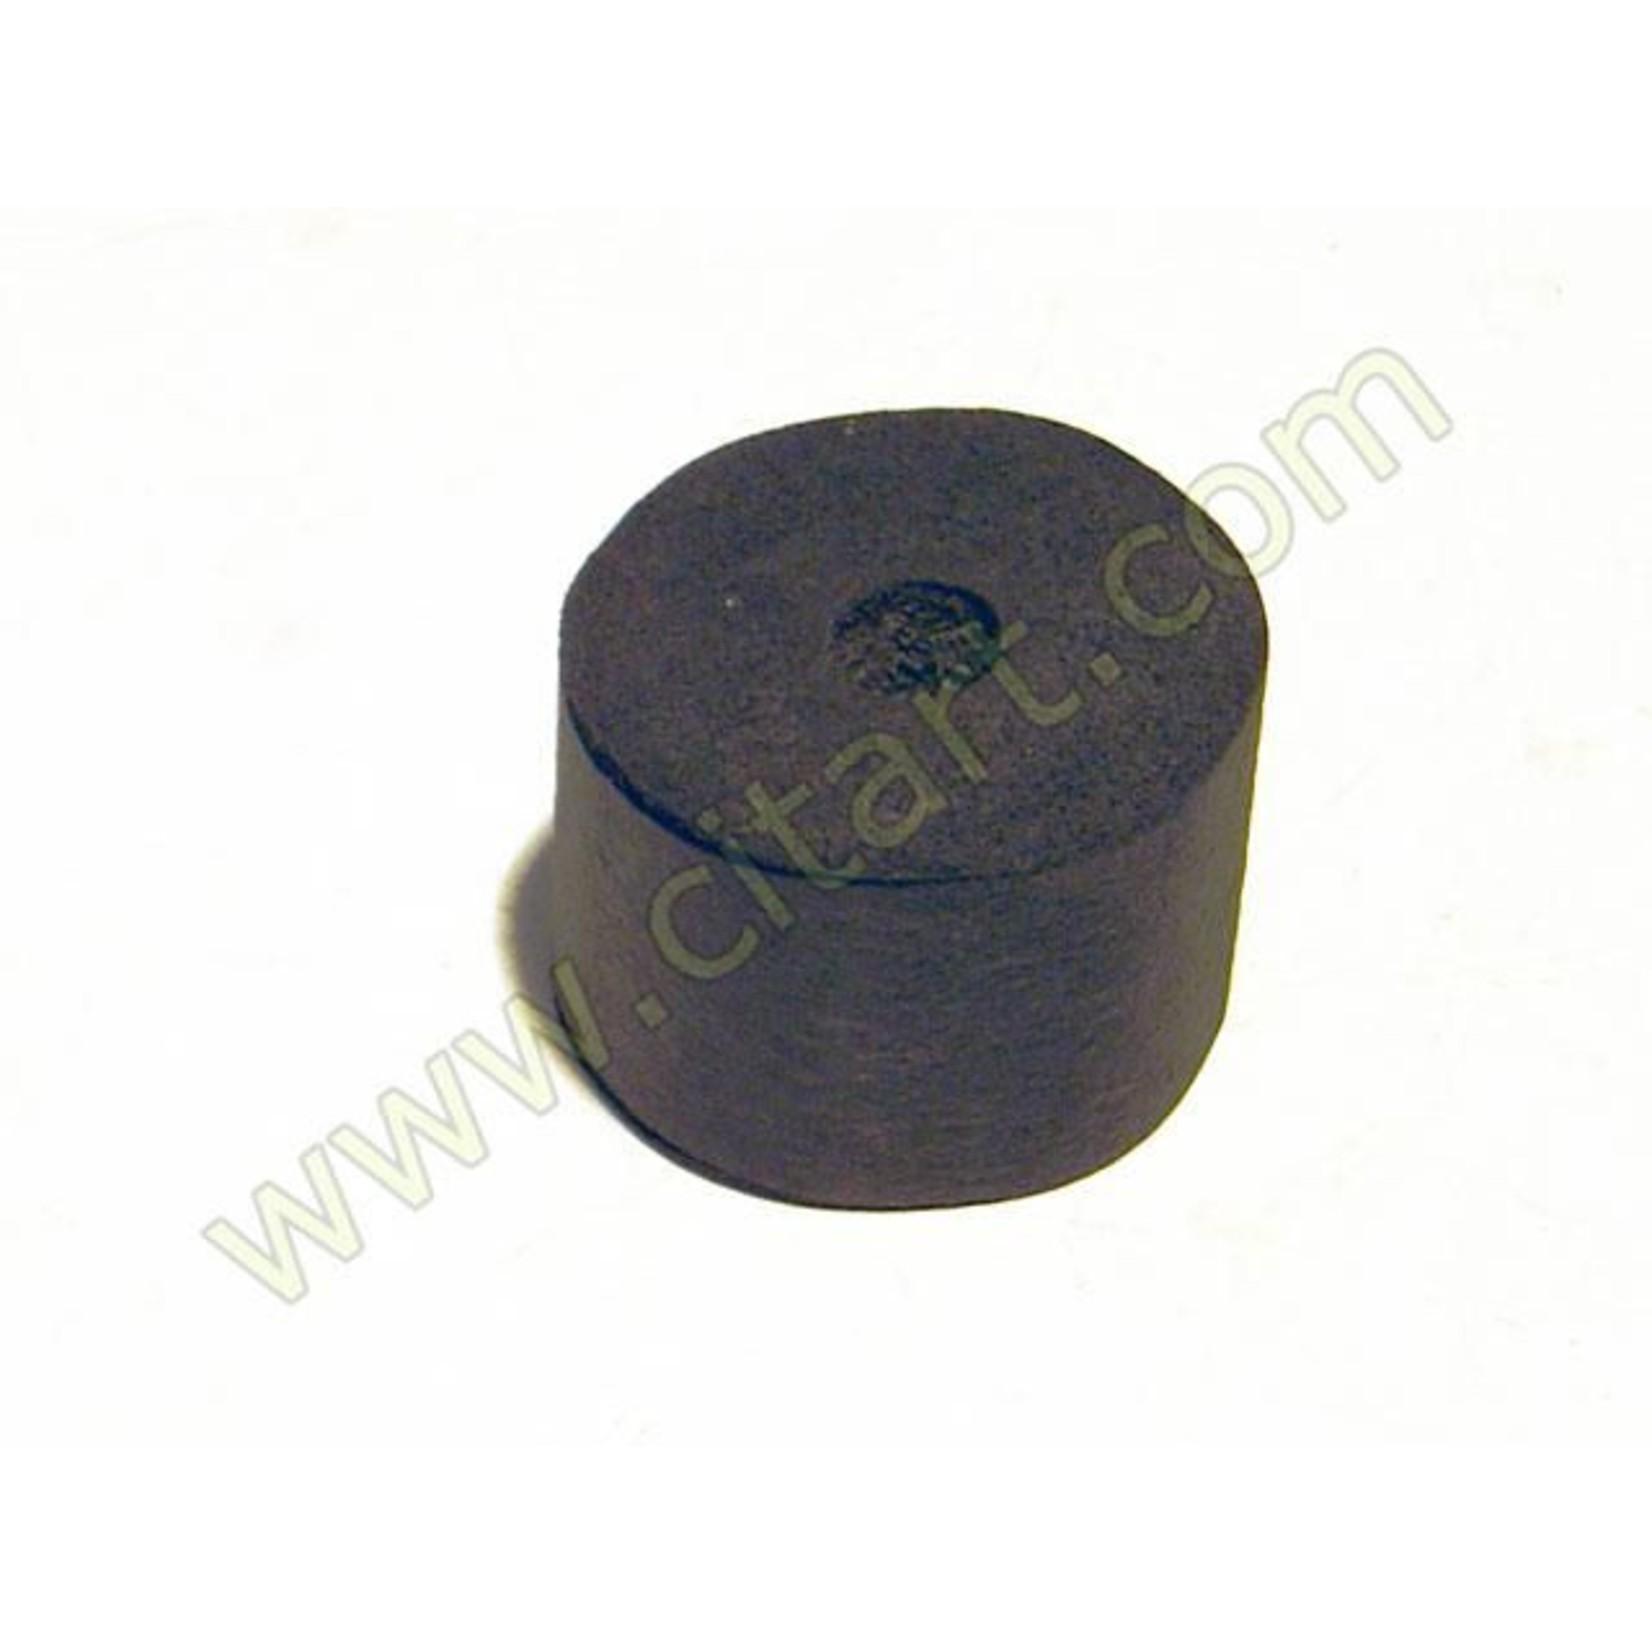 Passacable tubo gasolina / cableria plancha abordo Nr Org: DS1198